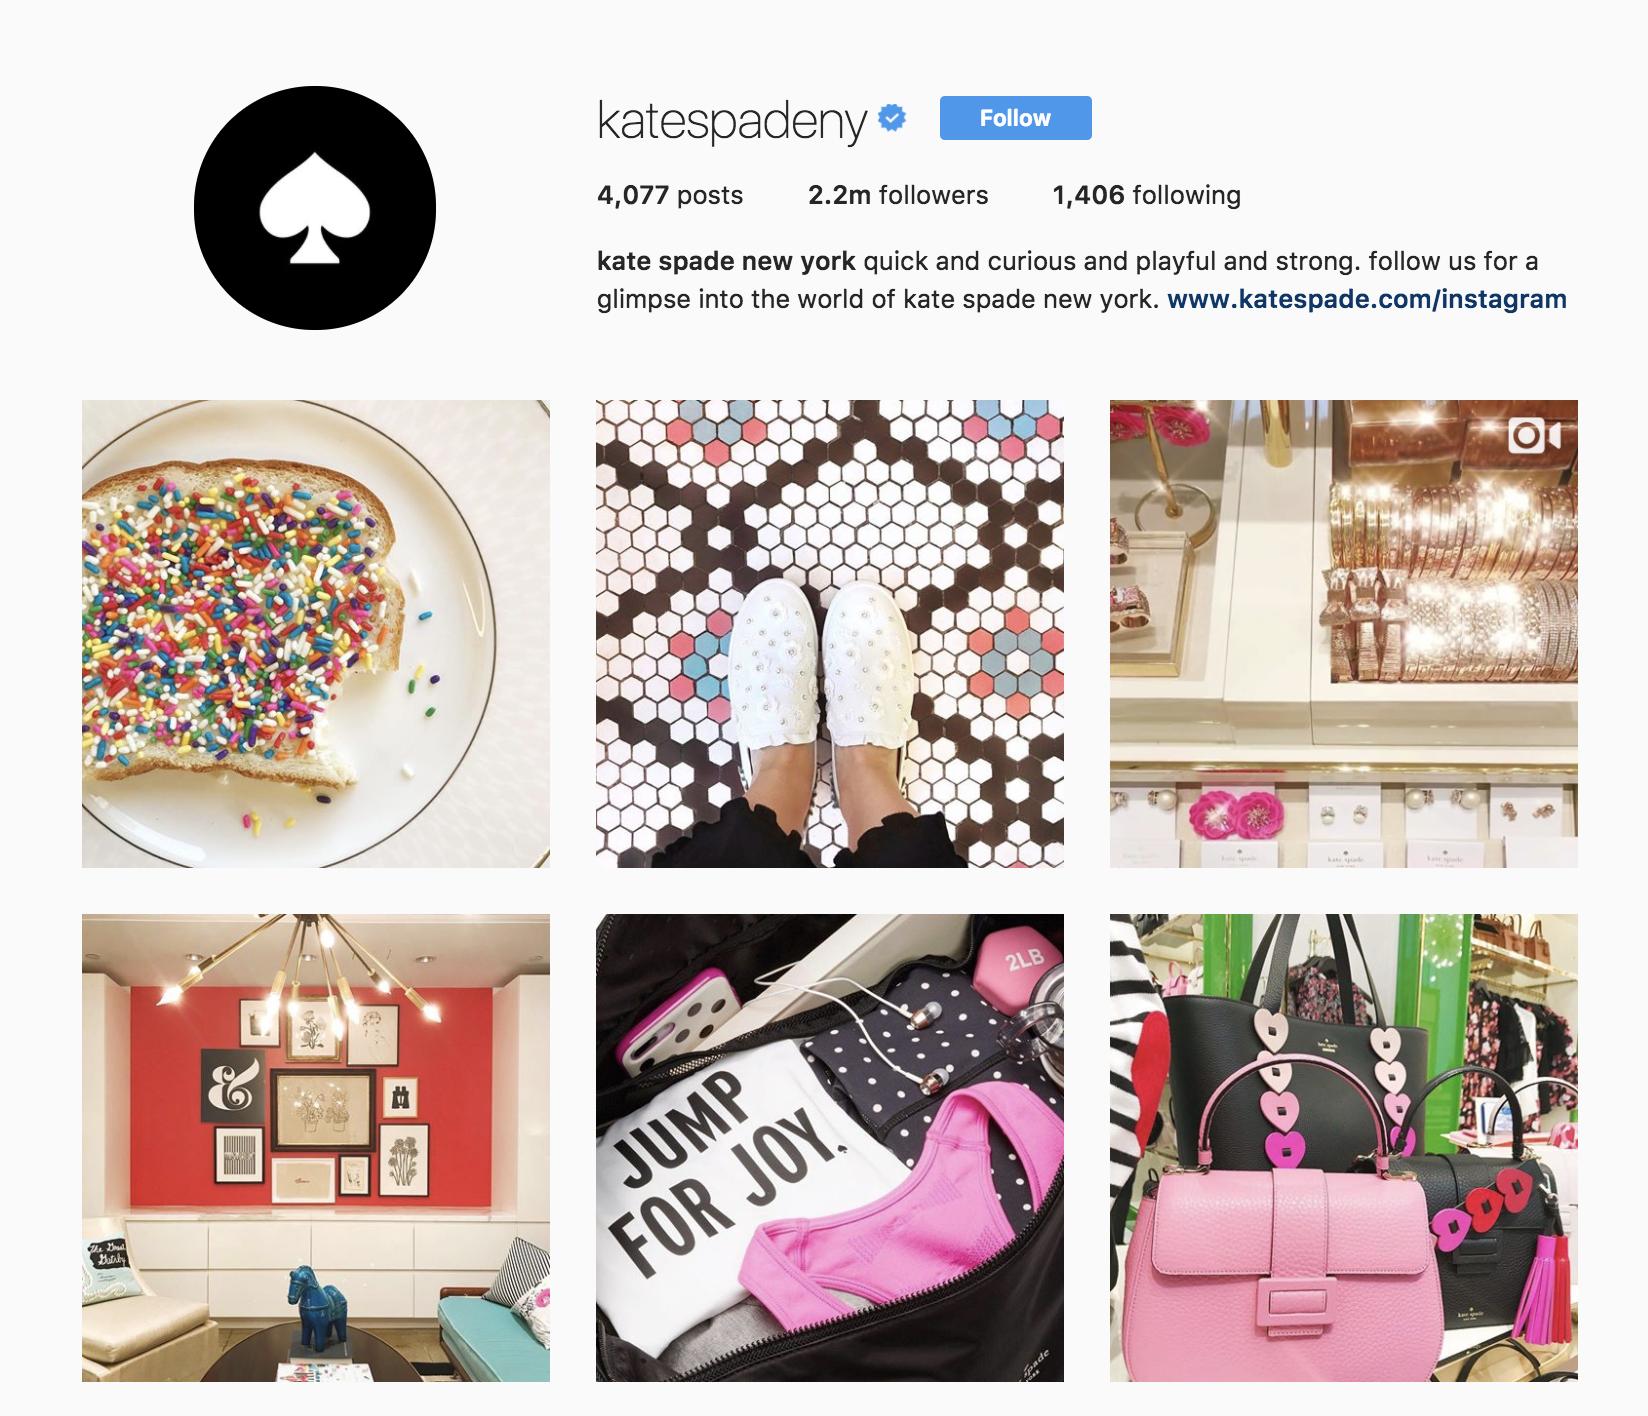 kate-spade-best-brands-on-instagram